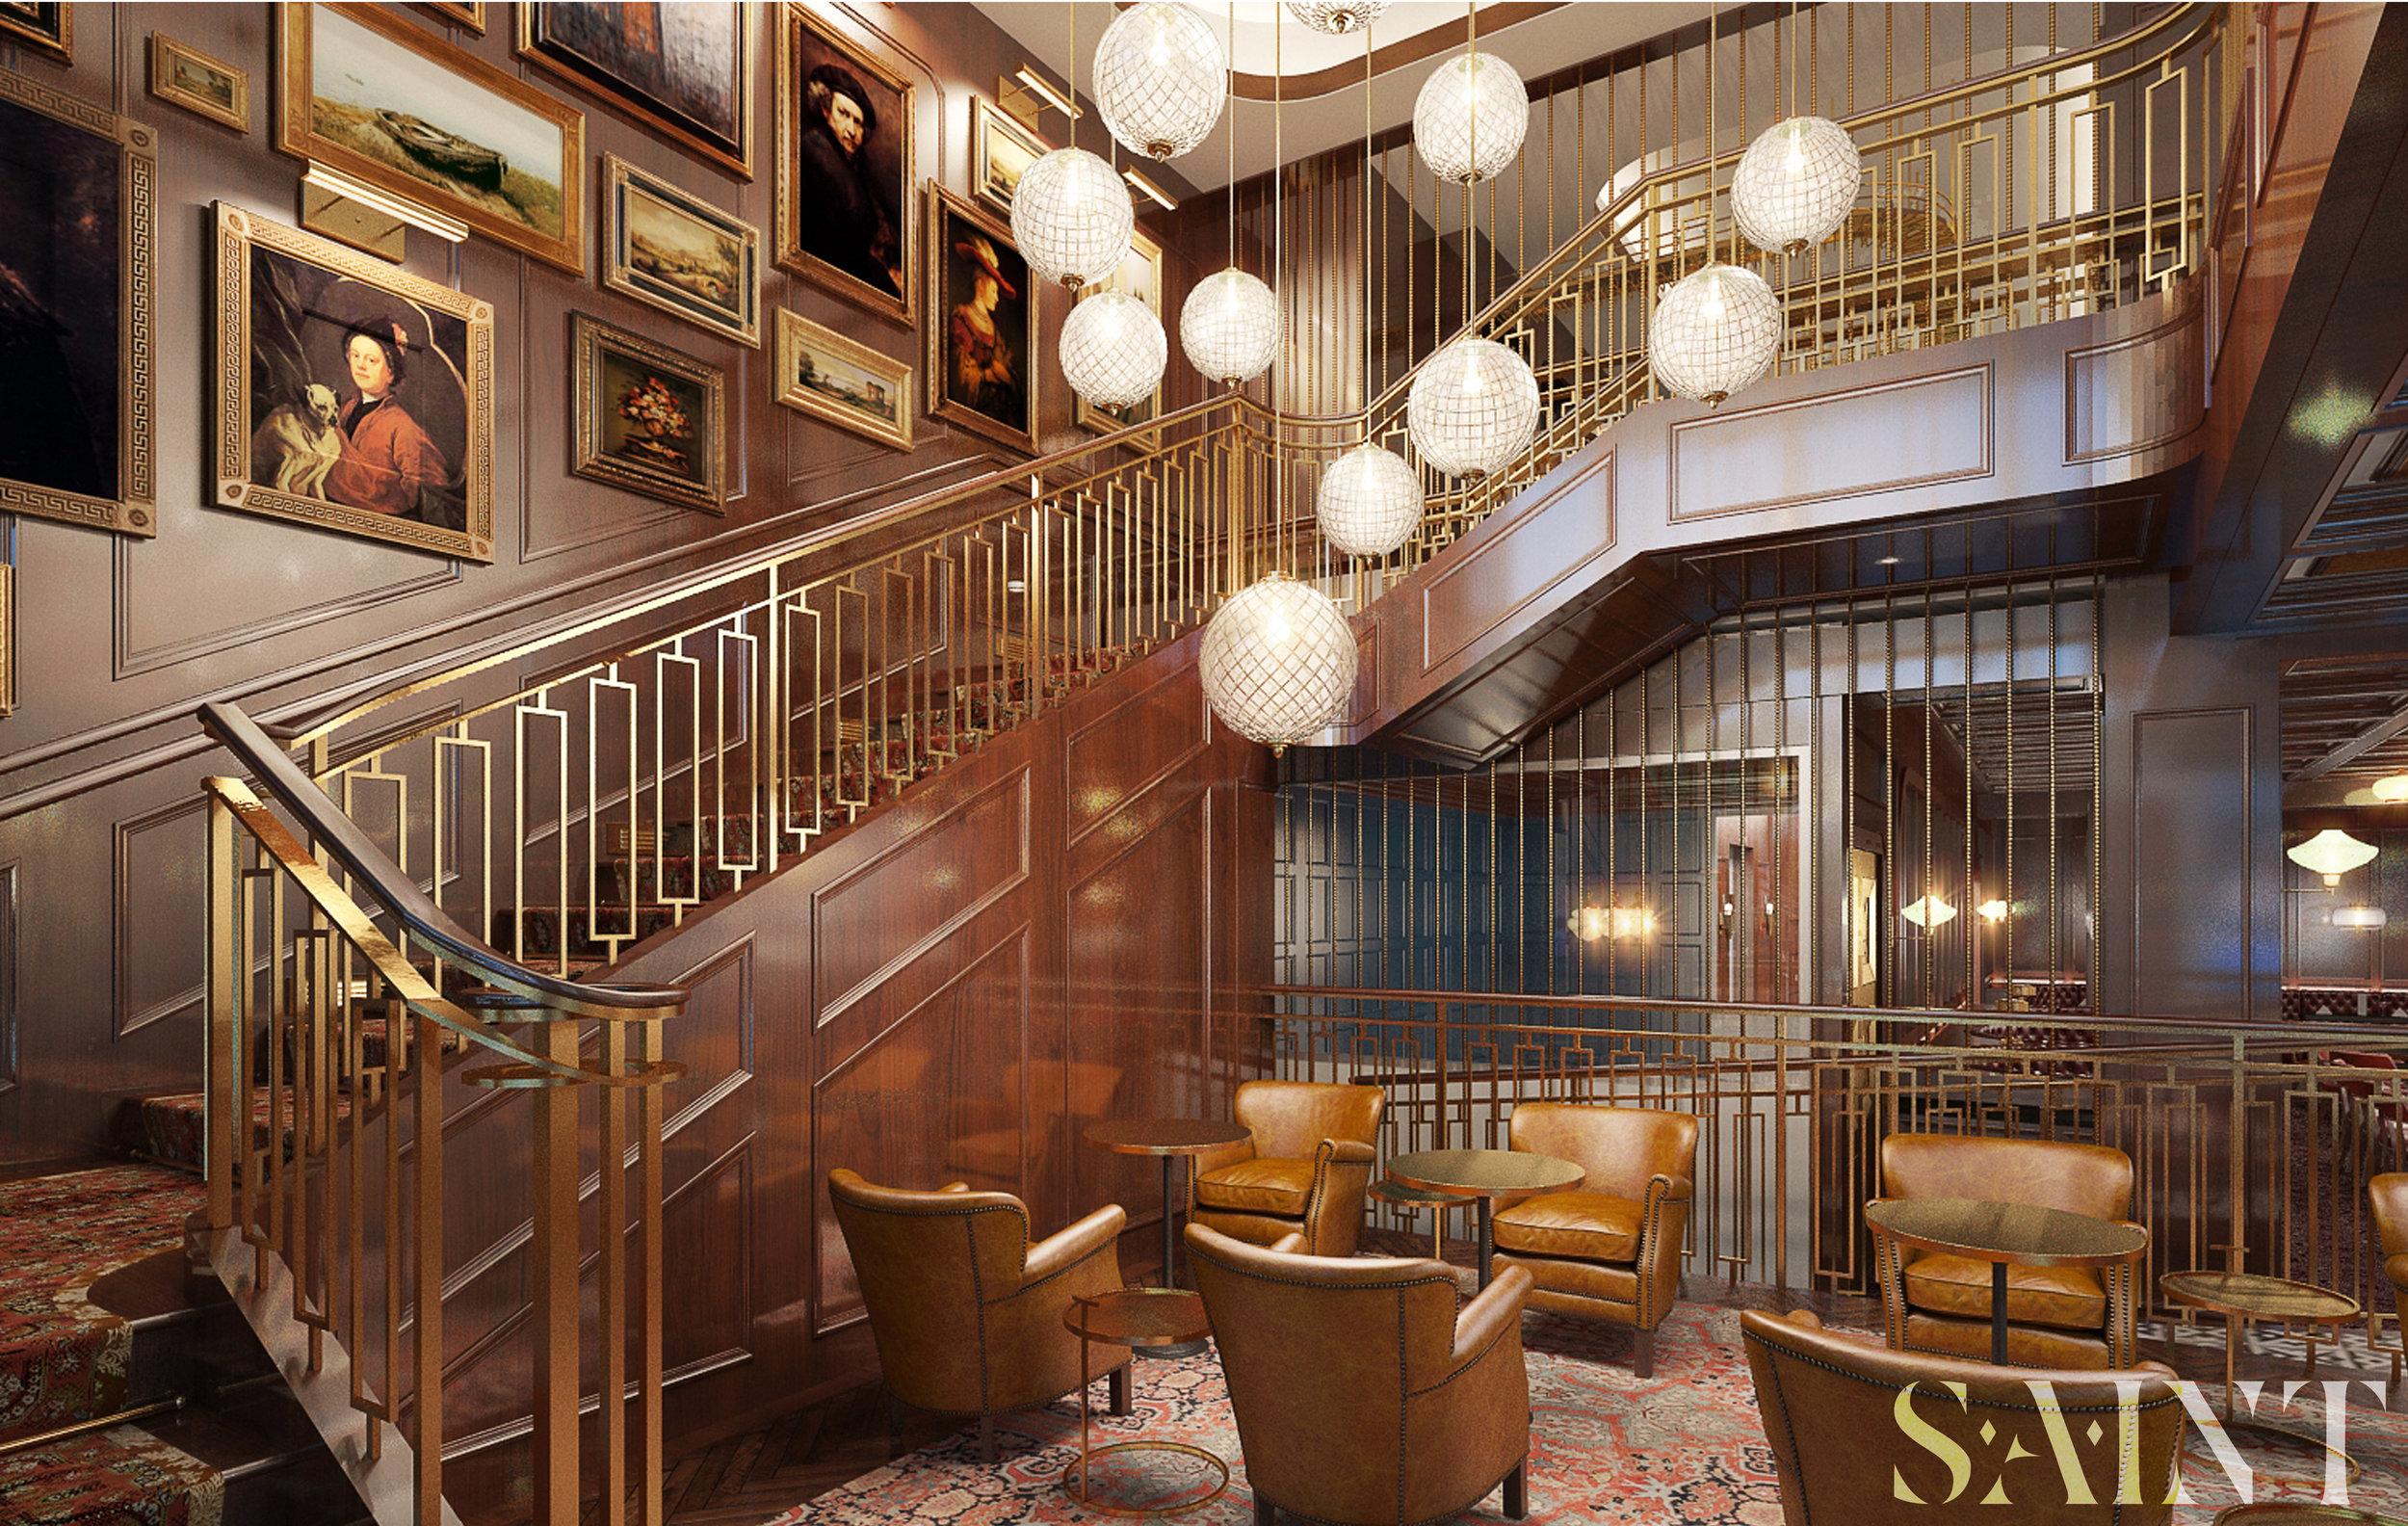 studio-saint-bars-and-restaurants-rare-steakhouse-washington-dc-rendering-1